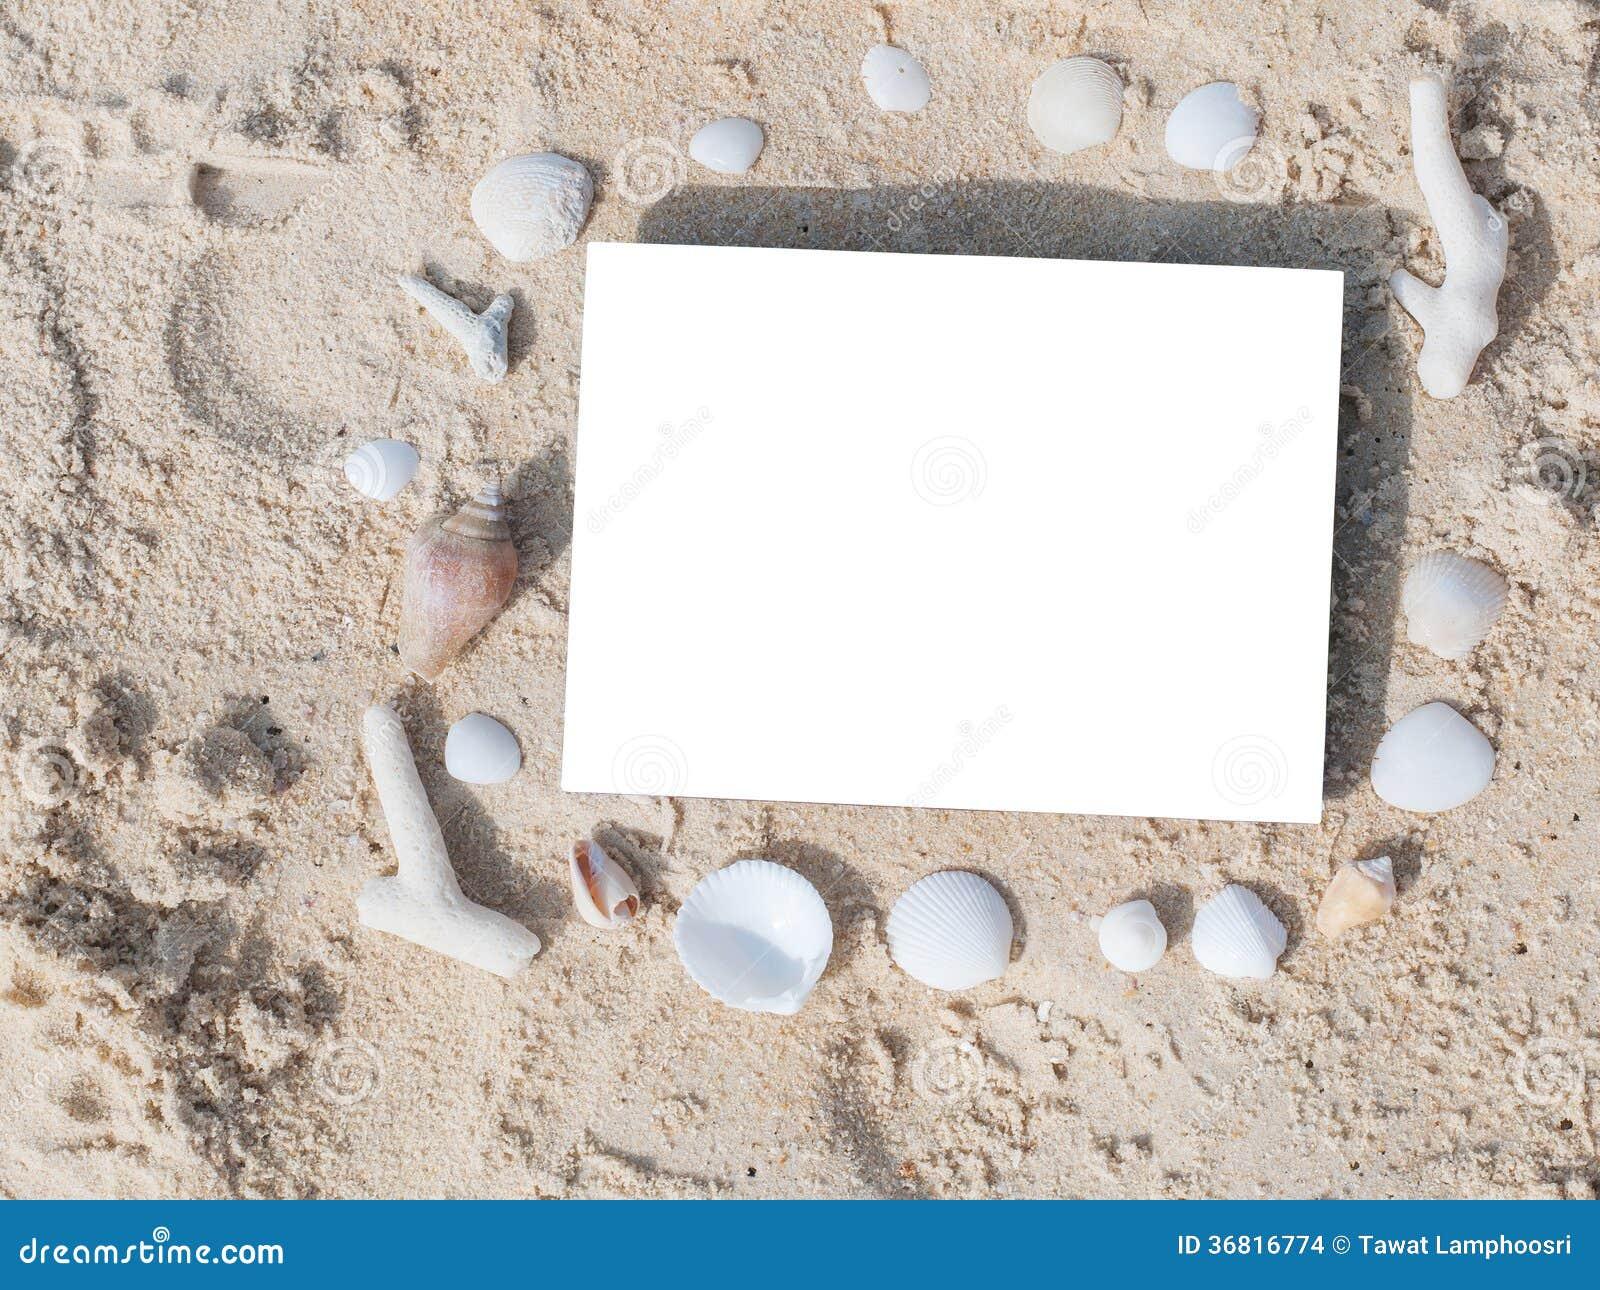 silverlight tabcontrol image header DGYpZ